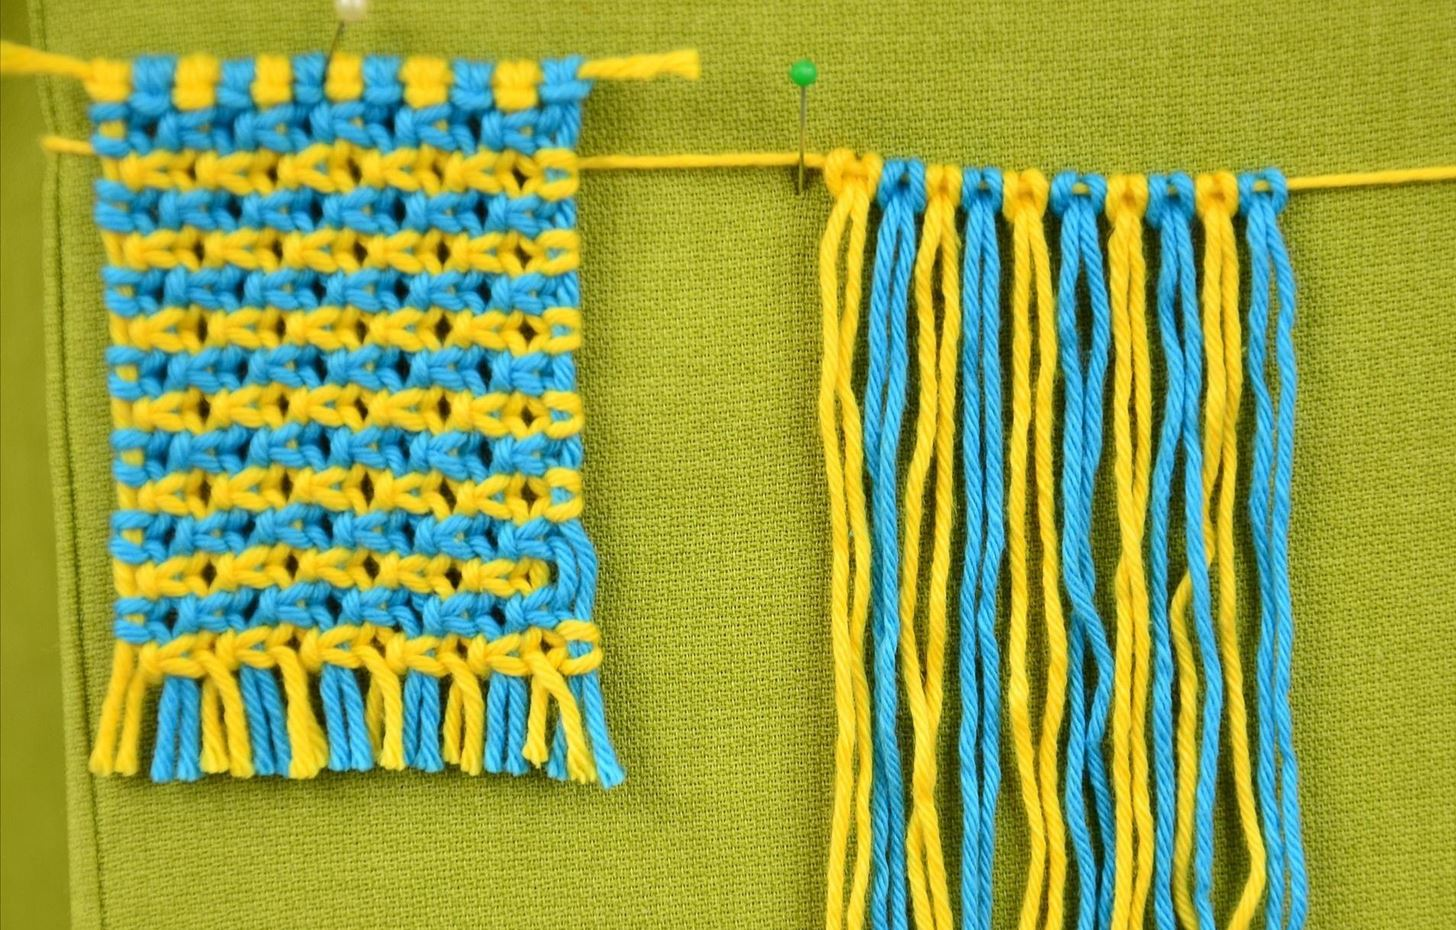 Crochet  Wikipedia